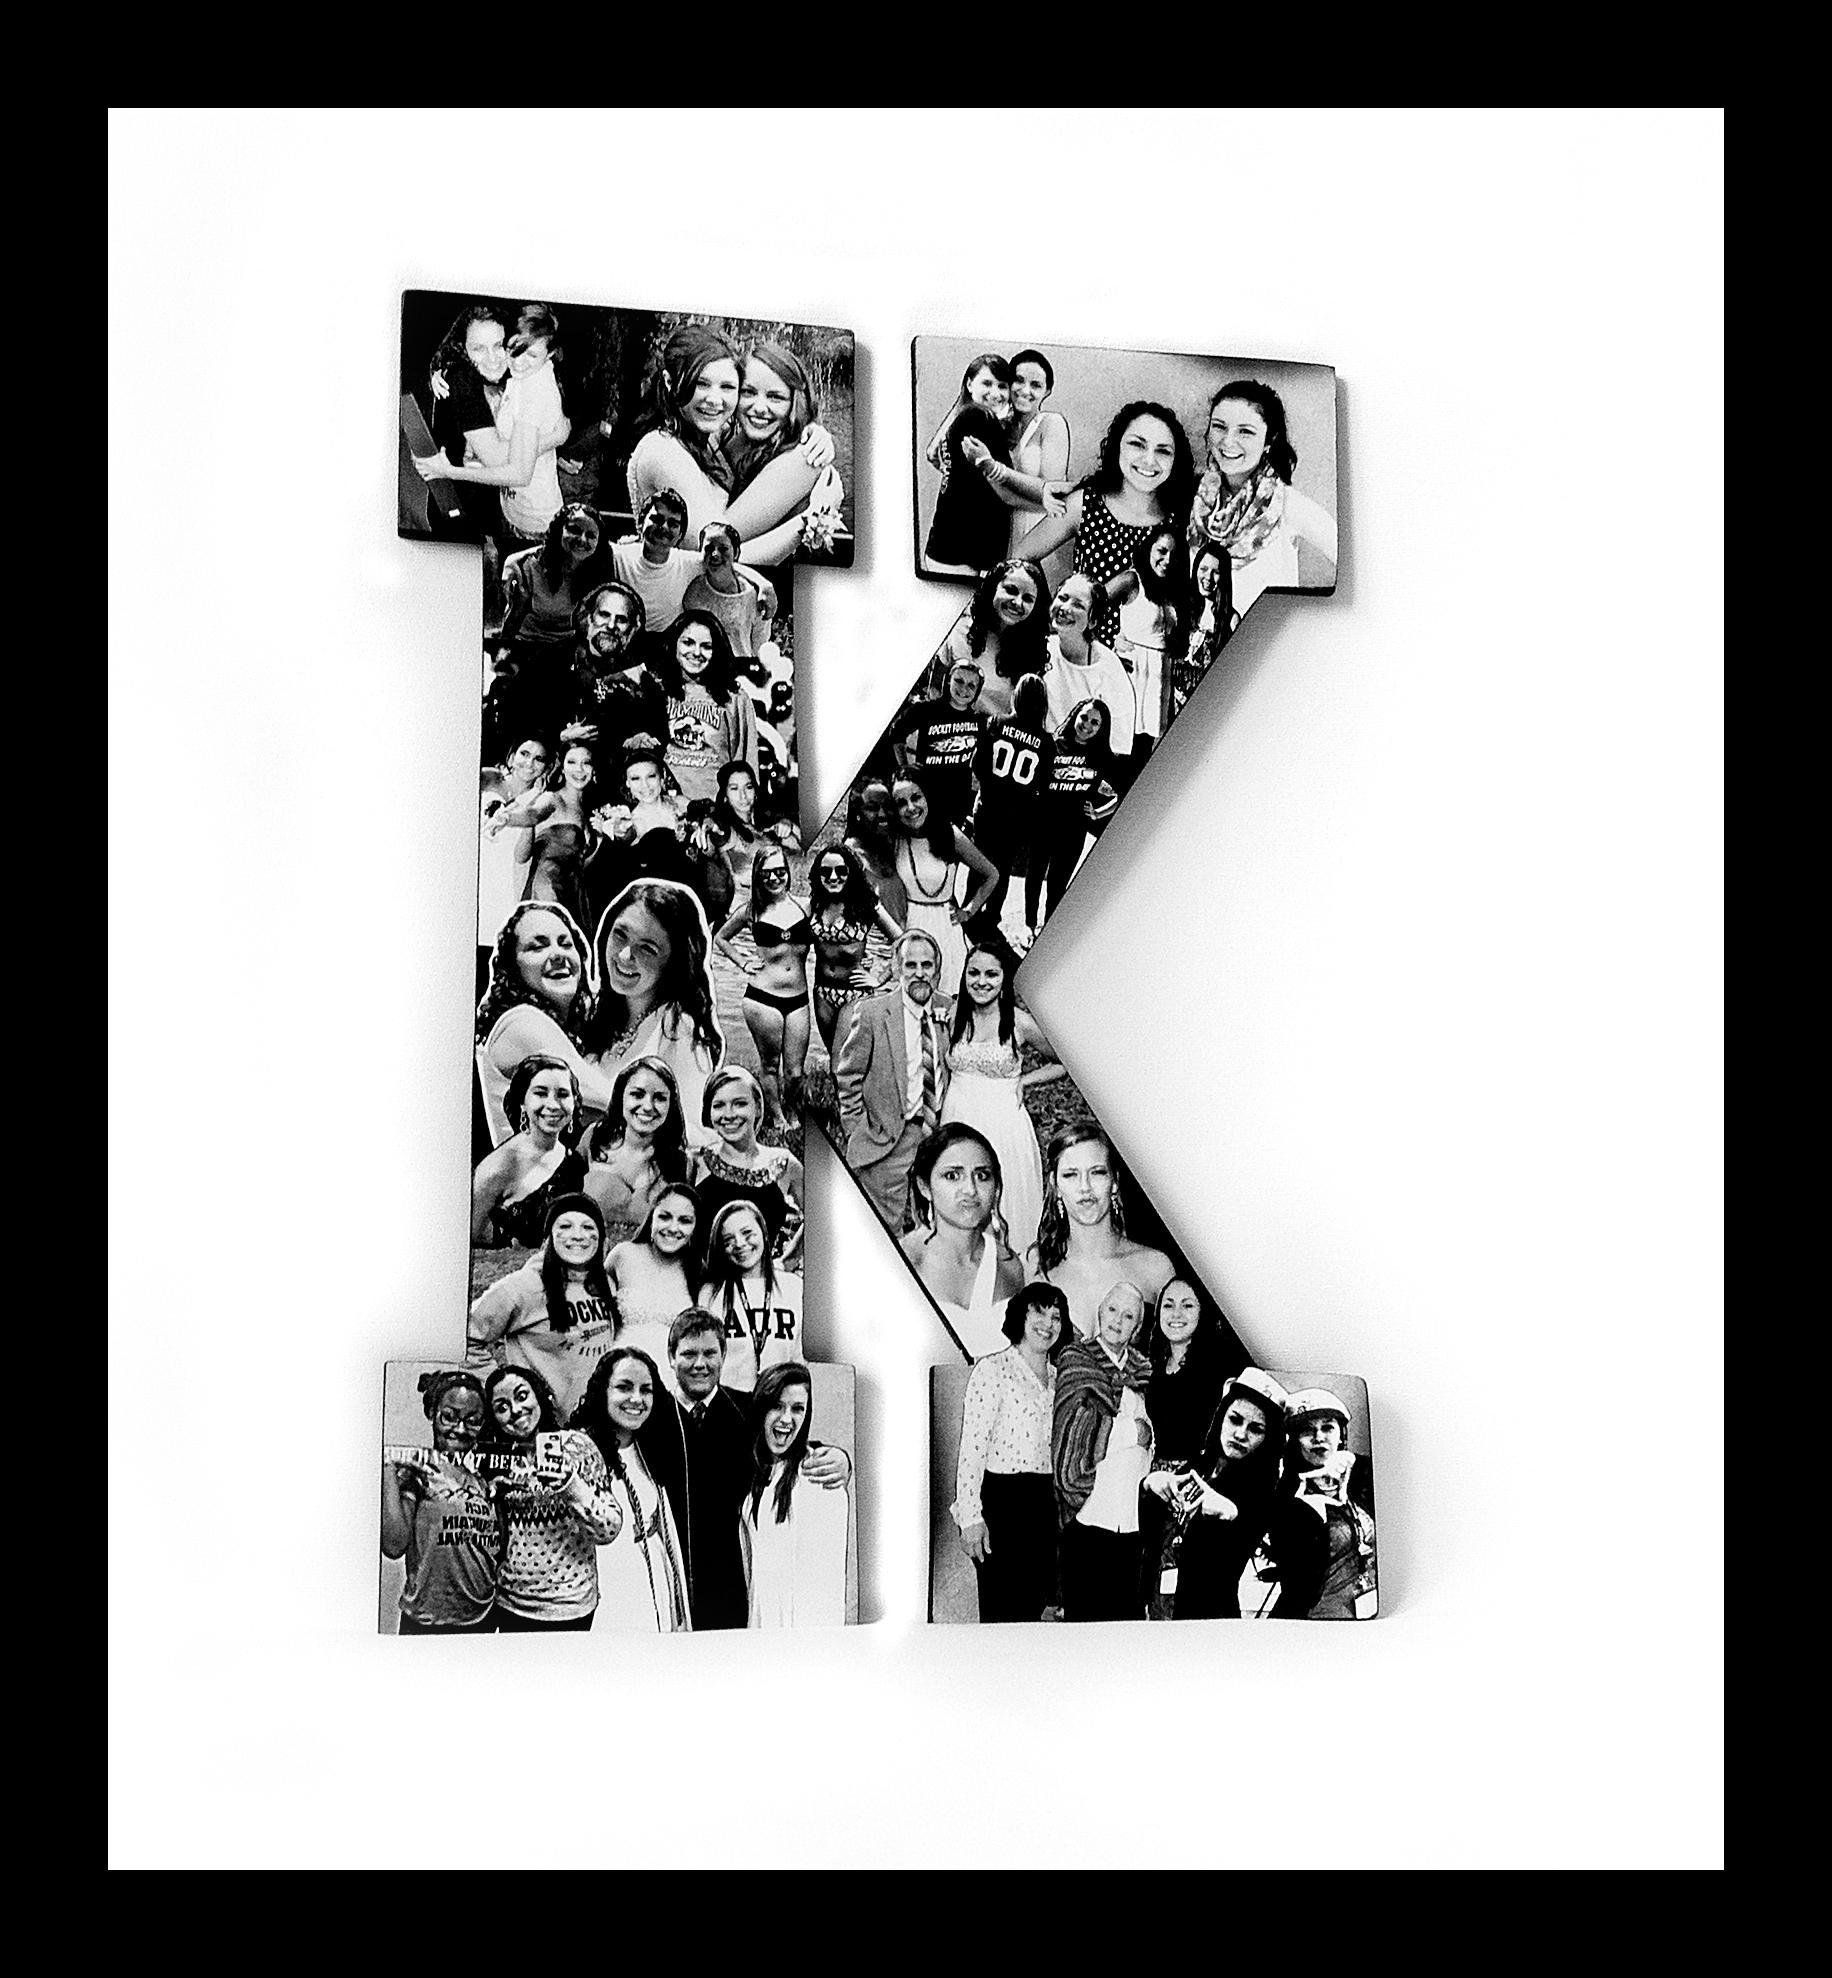 K ok Eckstein 7-14 (1)_edited-3.jpg